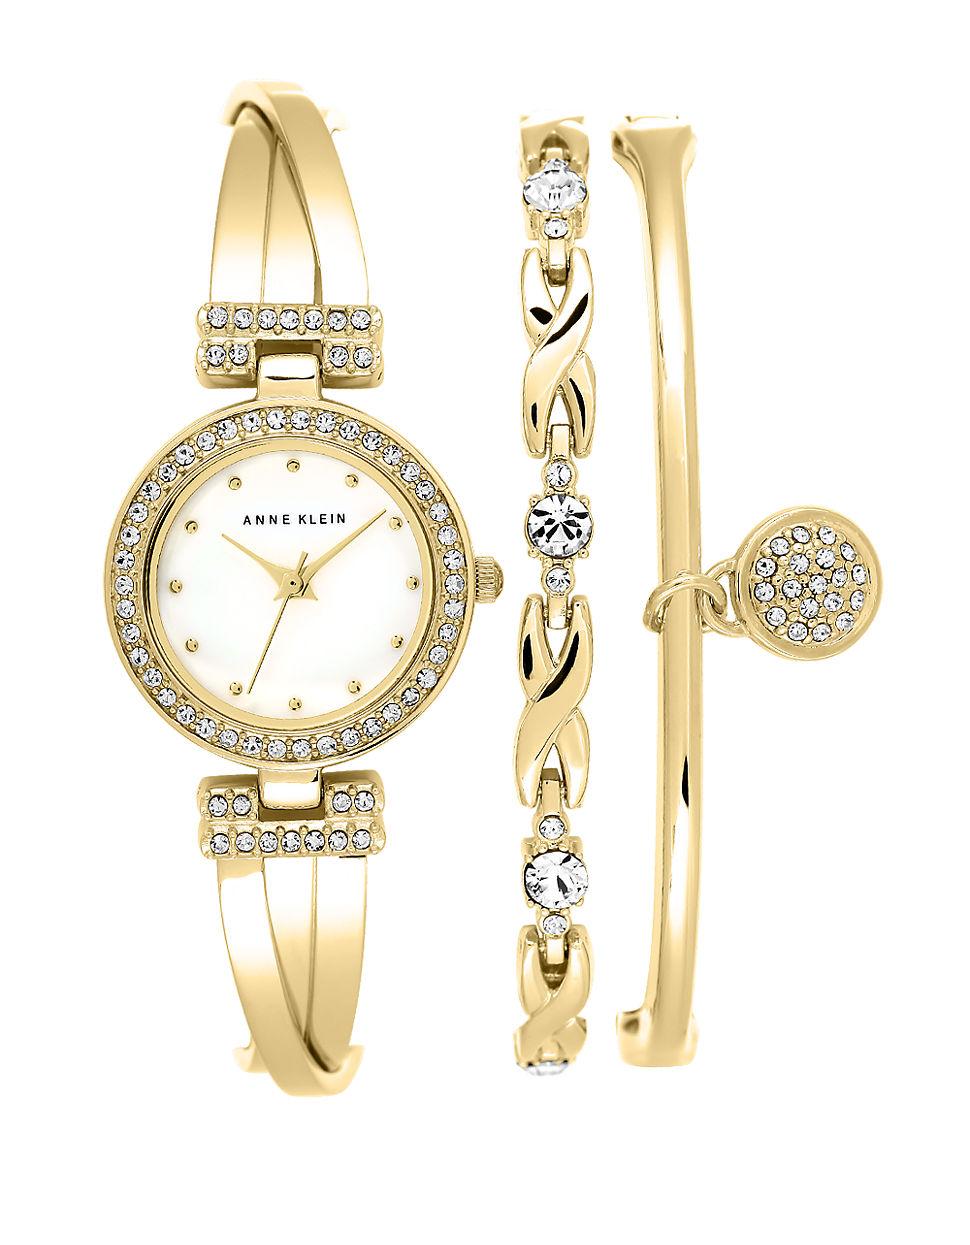 Lyst anne klein ladies swarovski crystal and goldtone bracelet watch set in metallic for Anne klein swarovski crystals